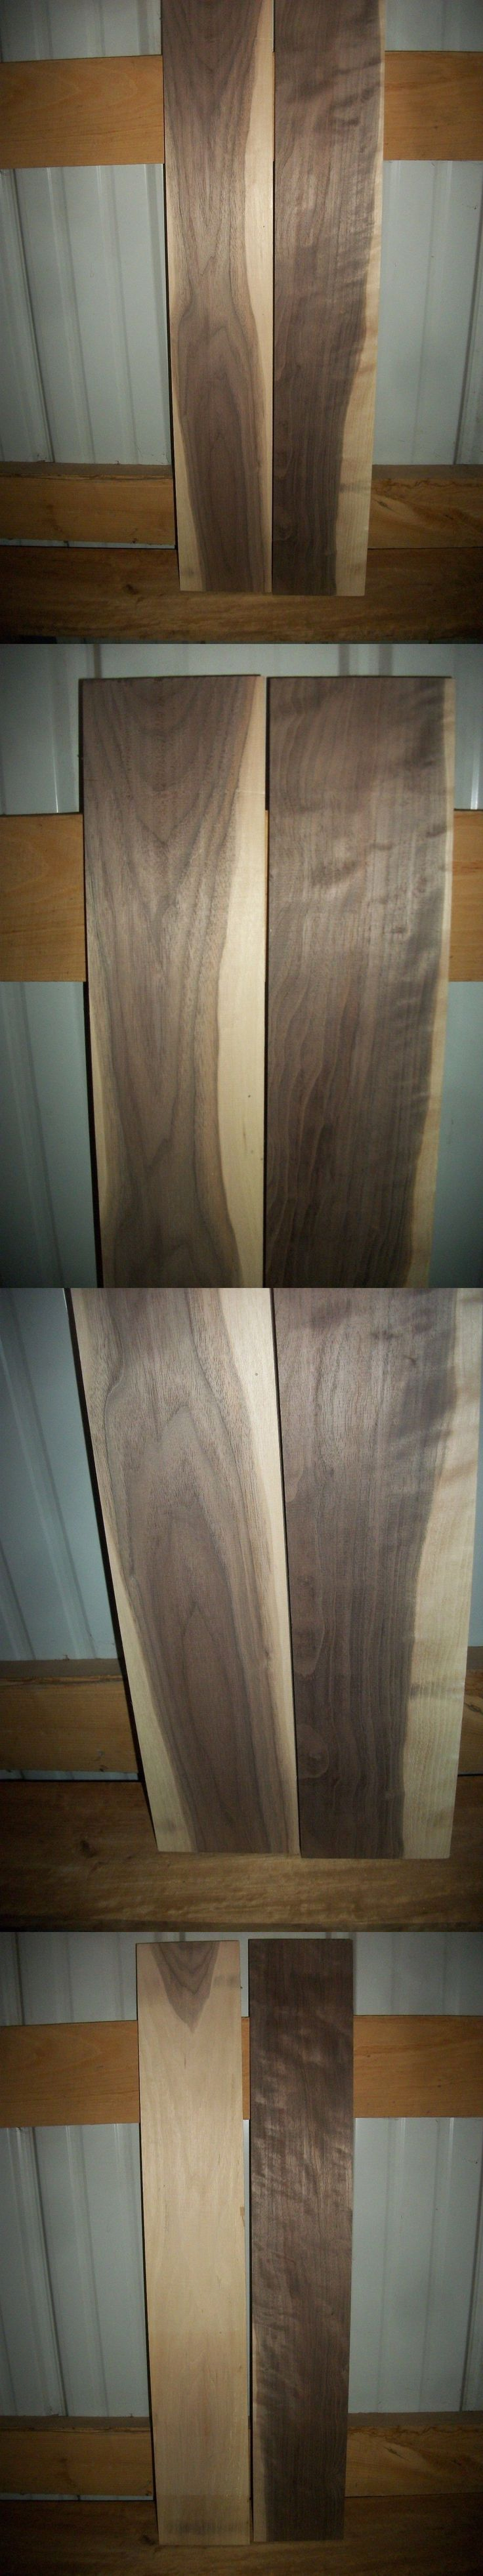 Cherry butcher block top 1 1 2 quot x 26 quot x38 quot kitchen island top ebay - Woodworking Lumber 84011 2 Pc Walnut Lumber Wood Kiln Dried Boards 13 16 Thick Lot